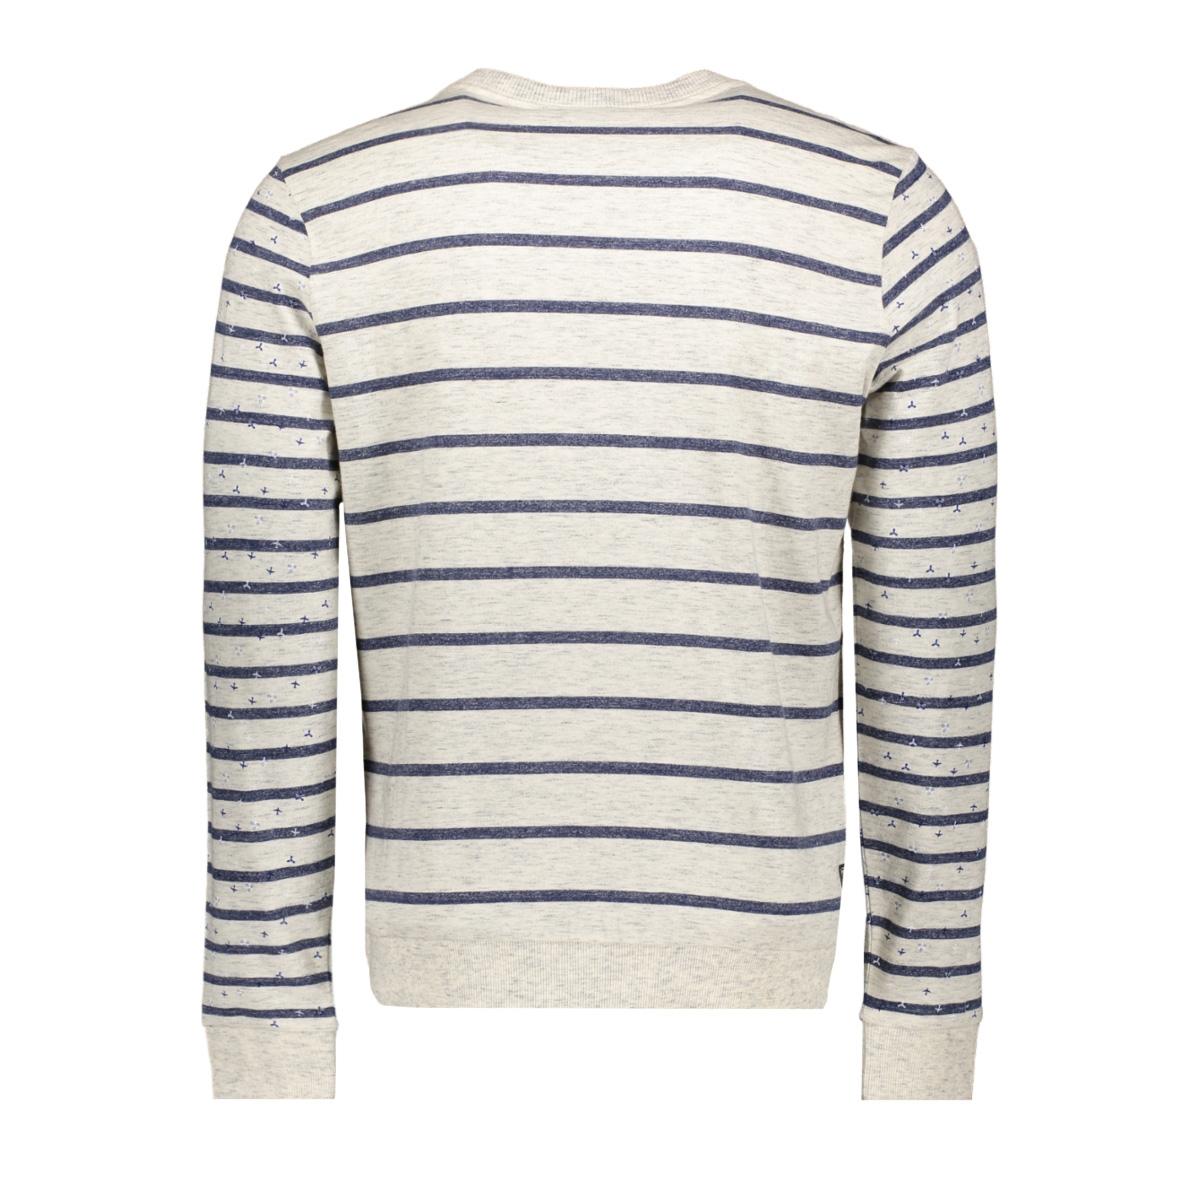 pts191551 pme legend t-shirt 7013